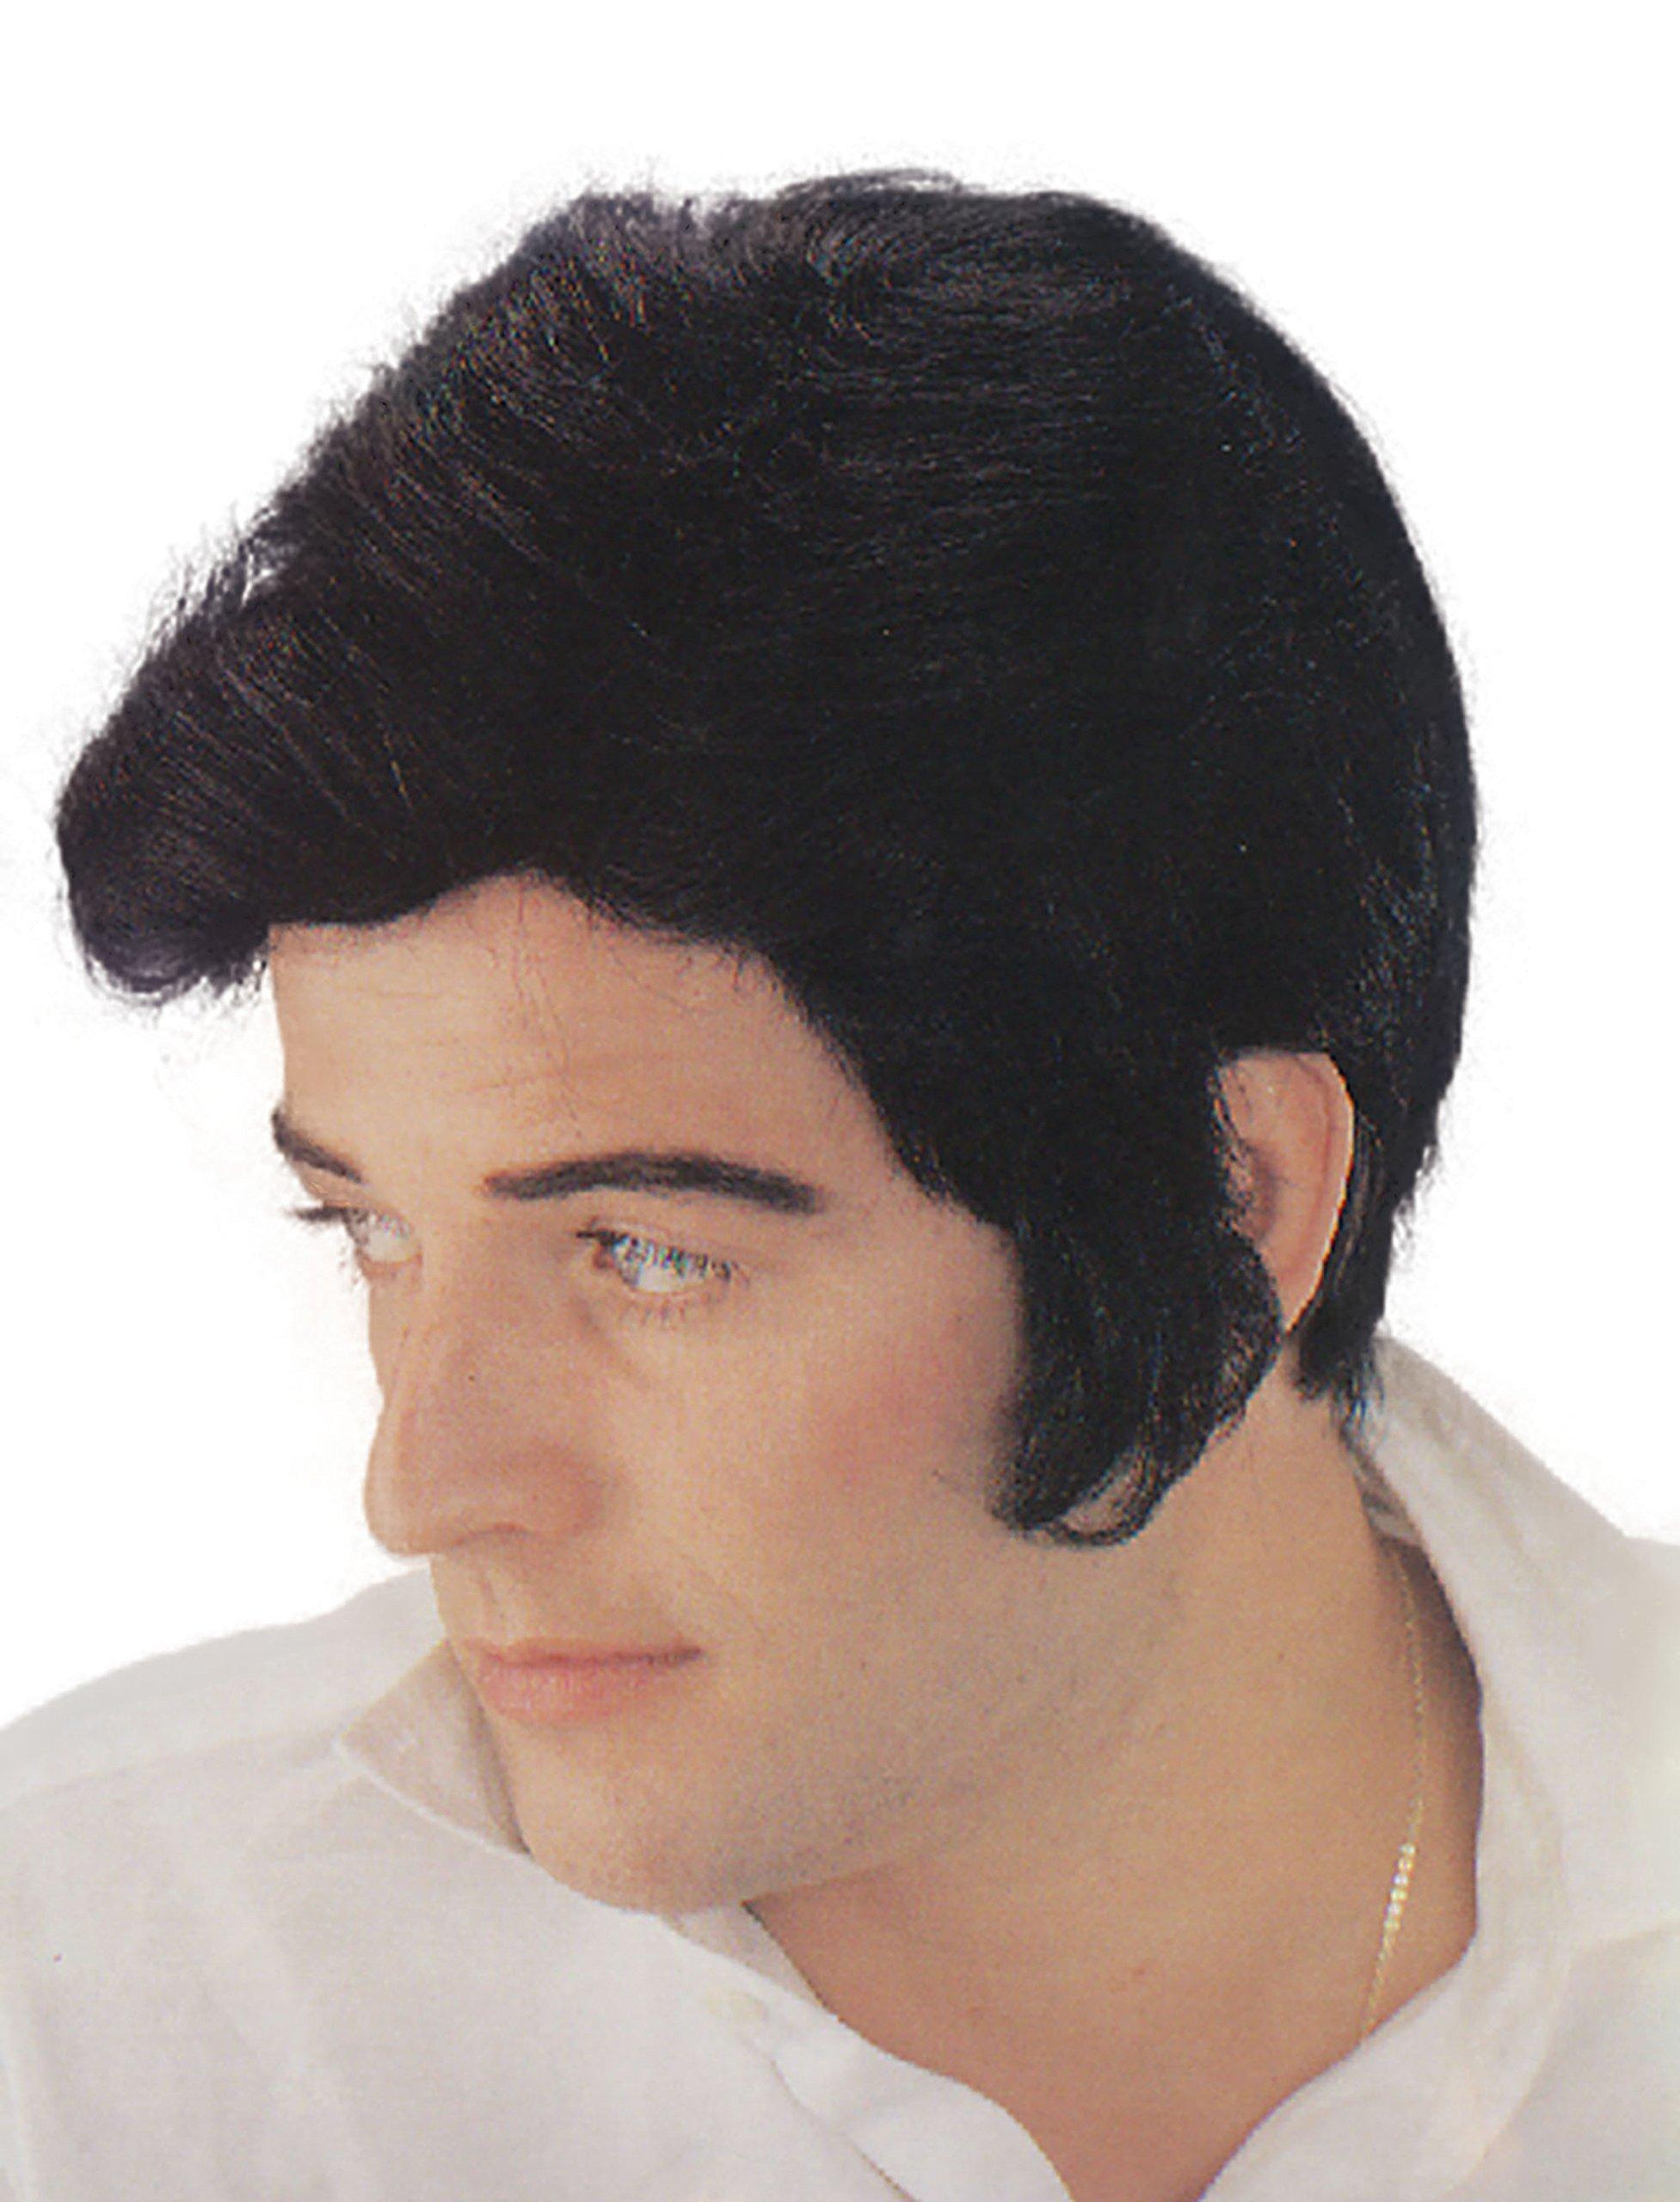 50's Rock Pop Star Wig